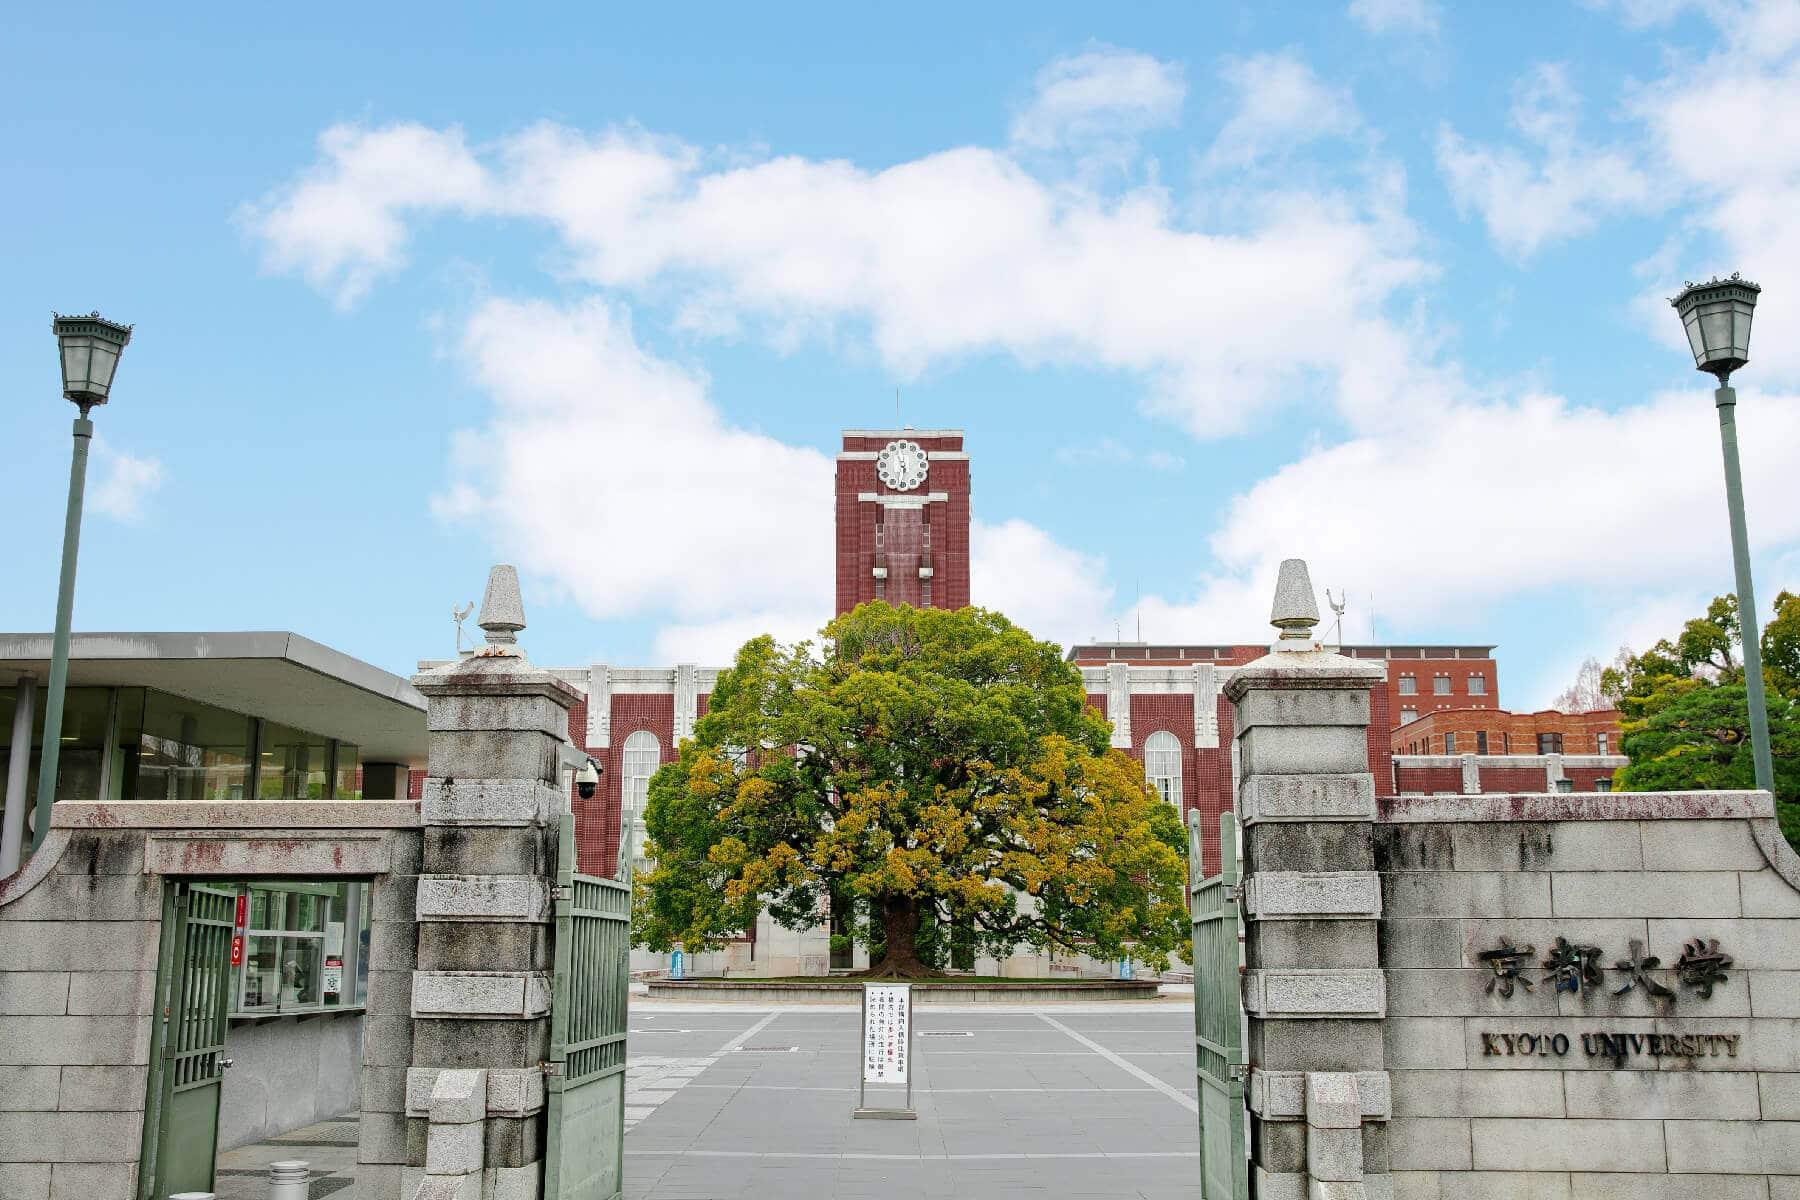 Kyoto-University